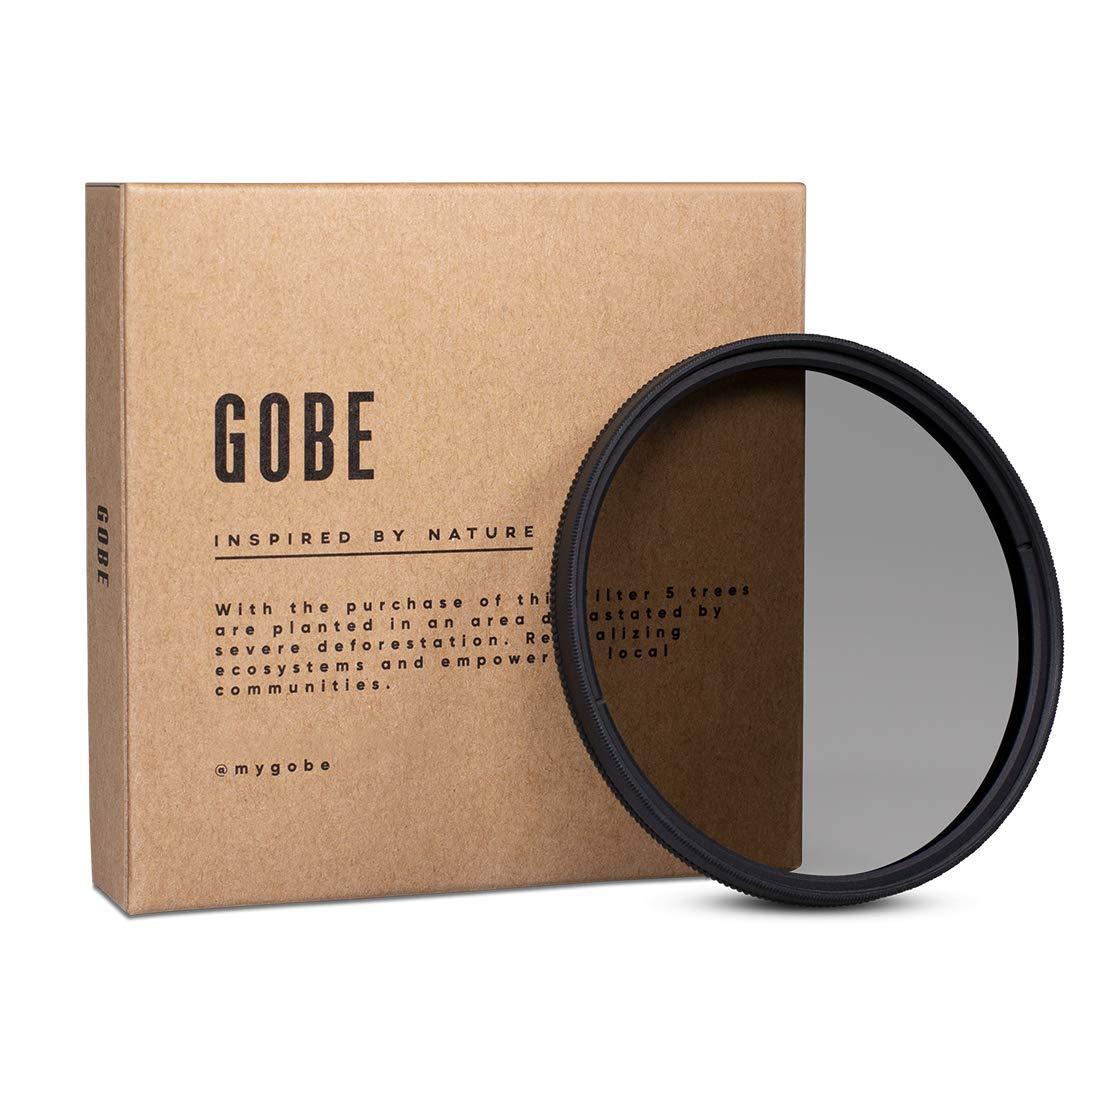 Gobe CPL 67mm Japan Optics Slim Polarized Filter